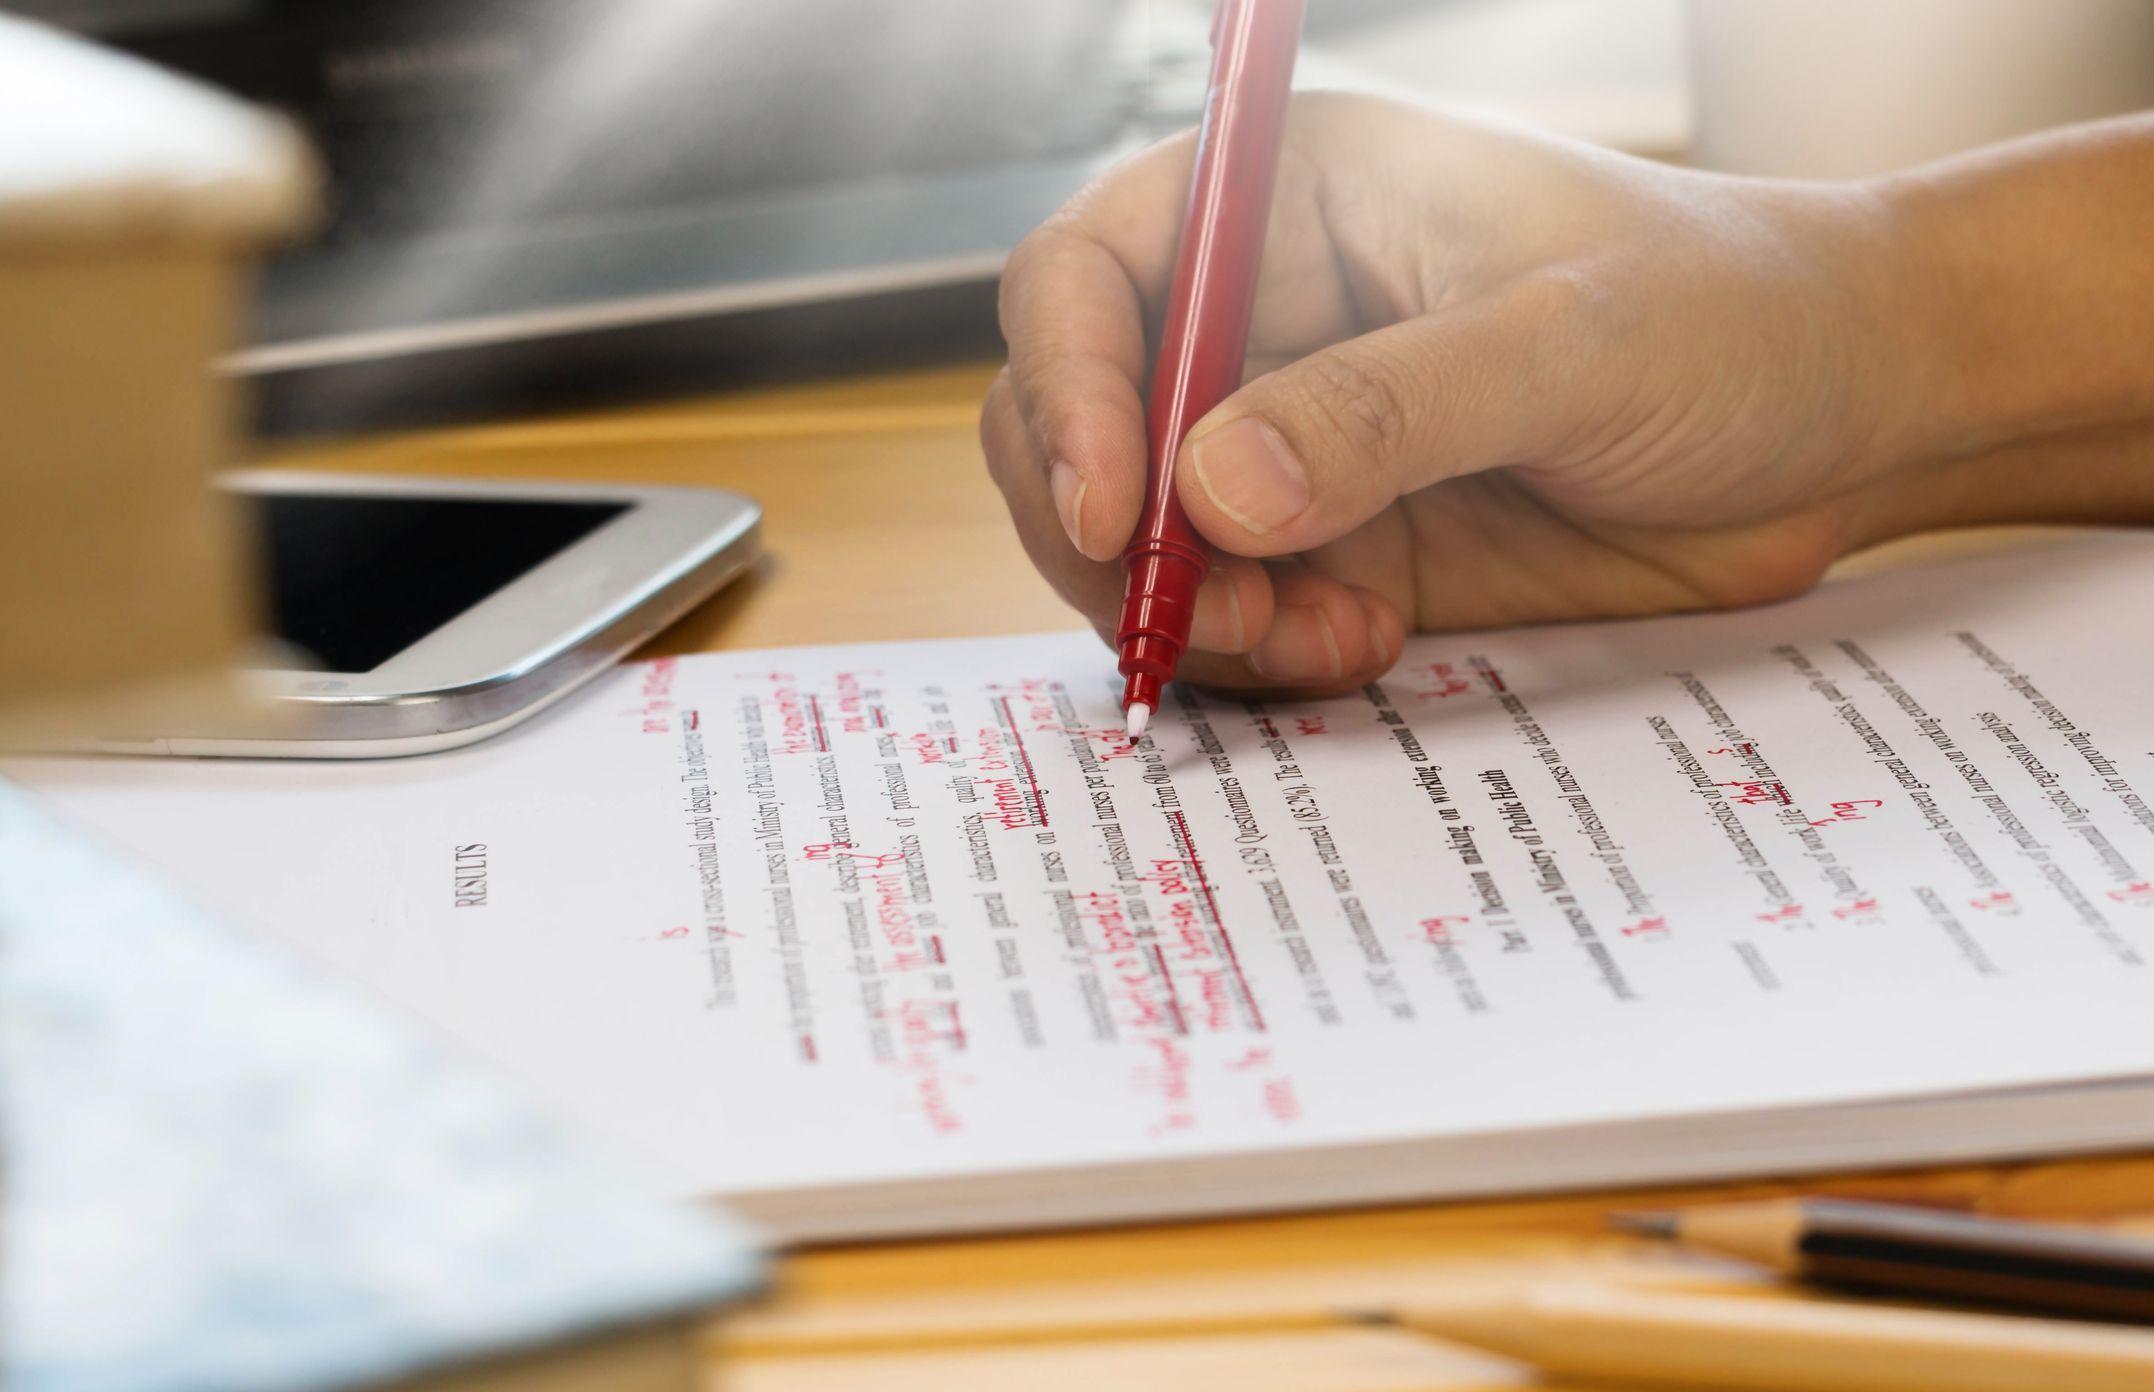 literature review in nursing education